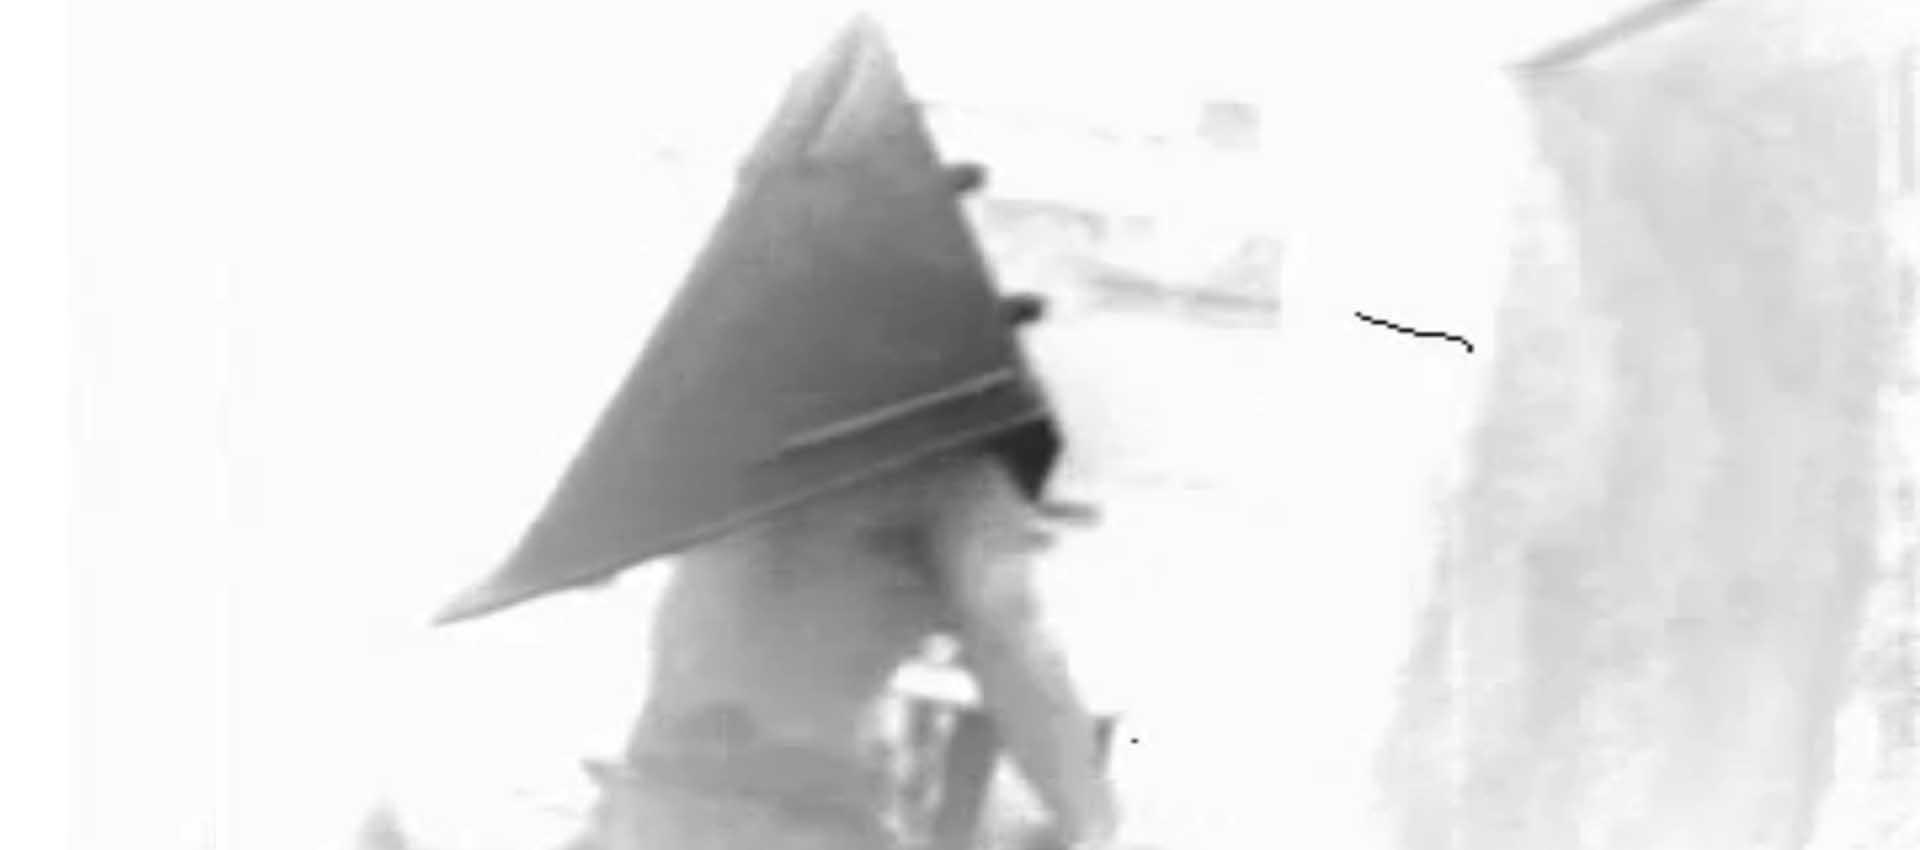 Pyramid Head MK2